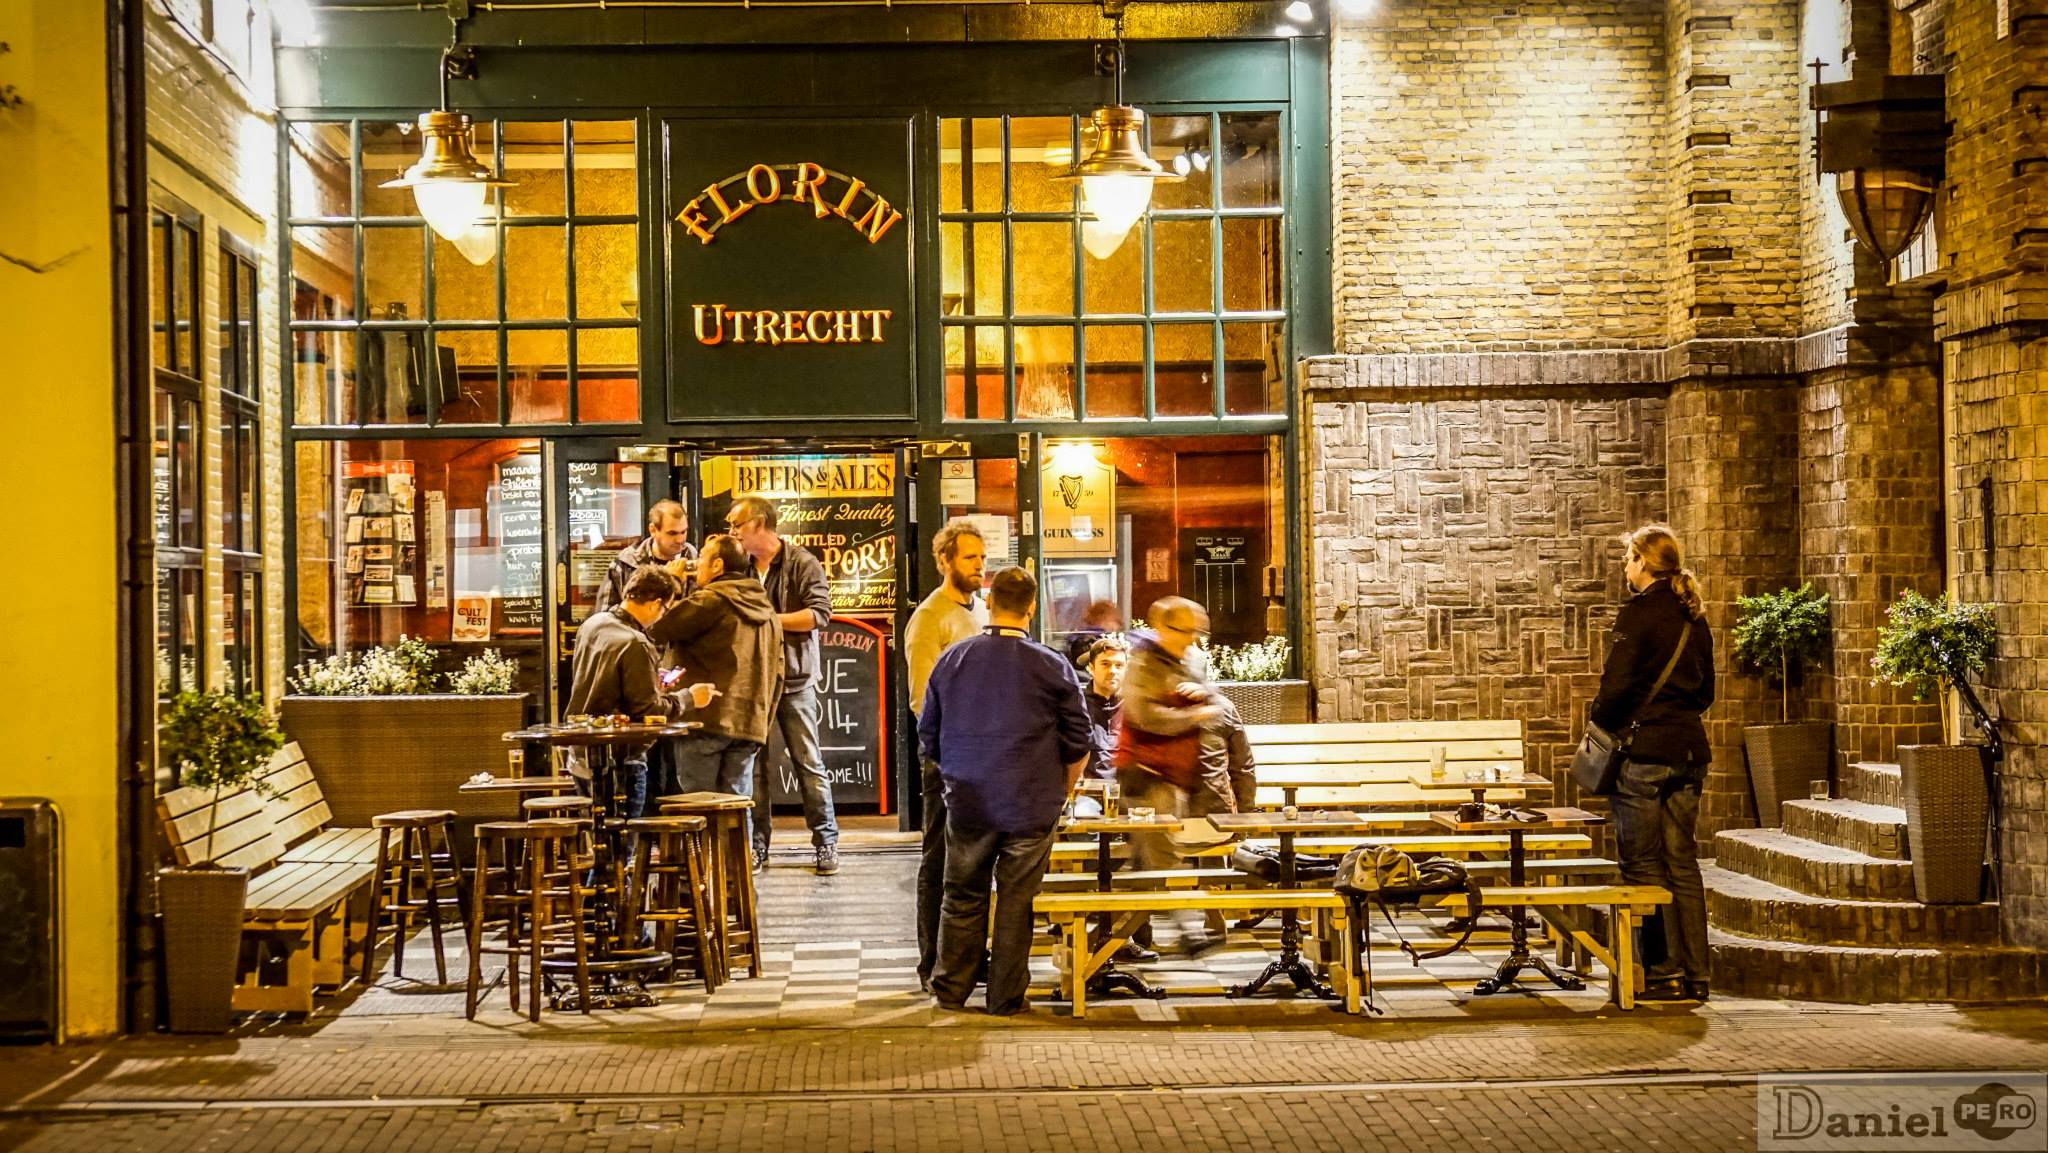 EUE2014 - Florin Utrecht - image by Daniel Pero